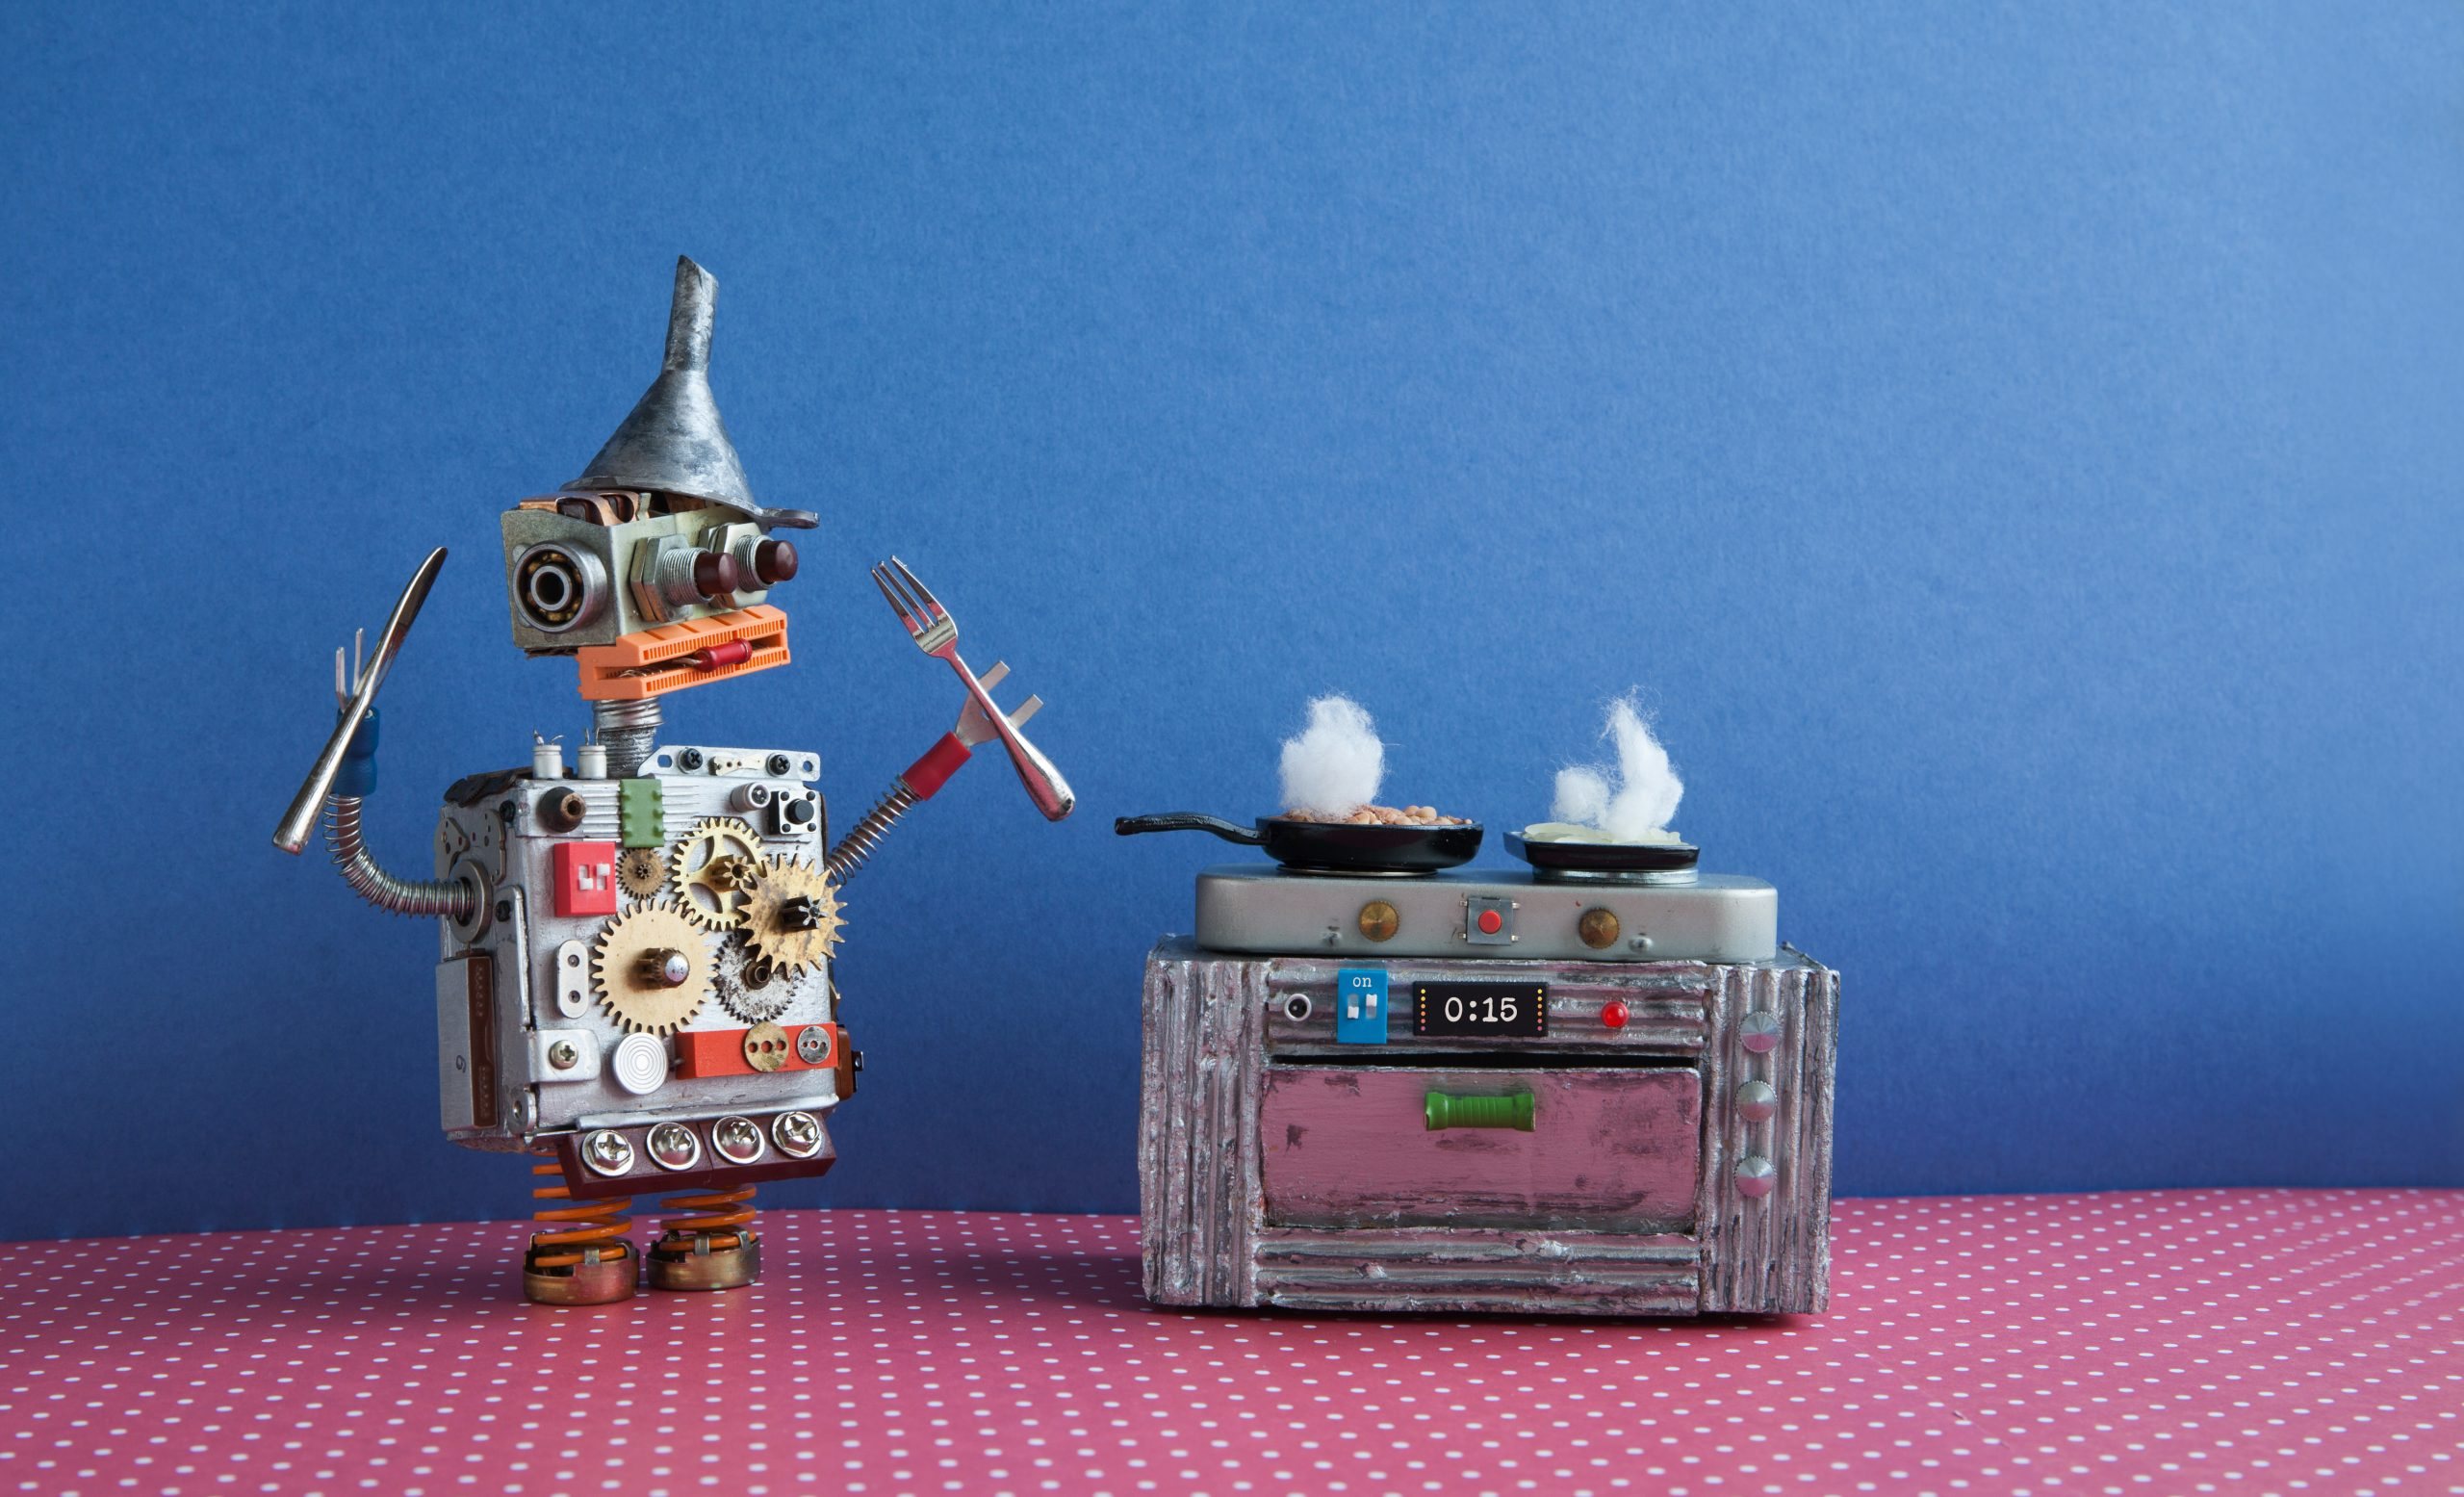 un robot como juguete electrónico para niños